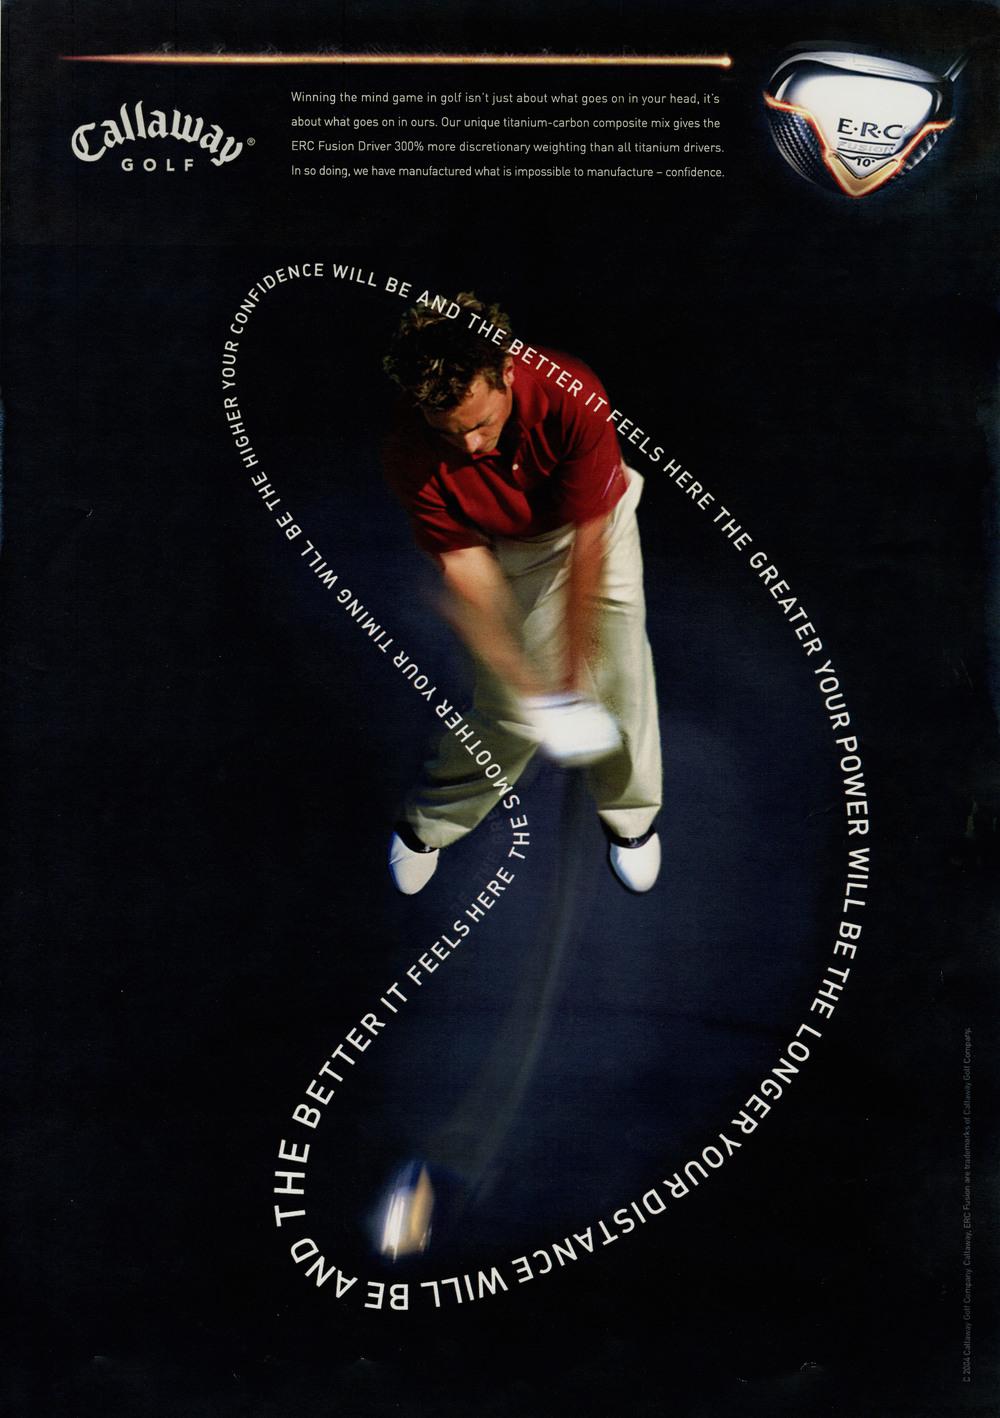 Callaway Golf Fusion print